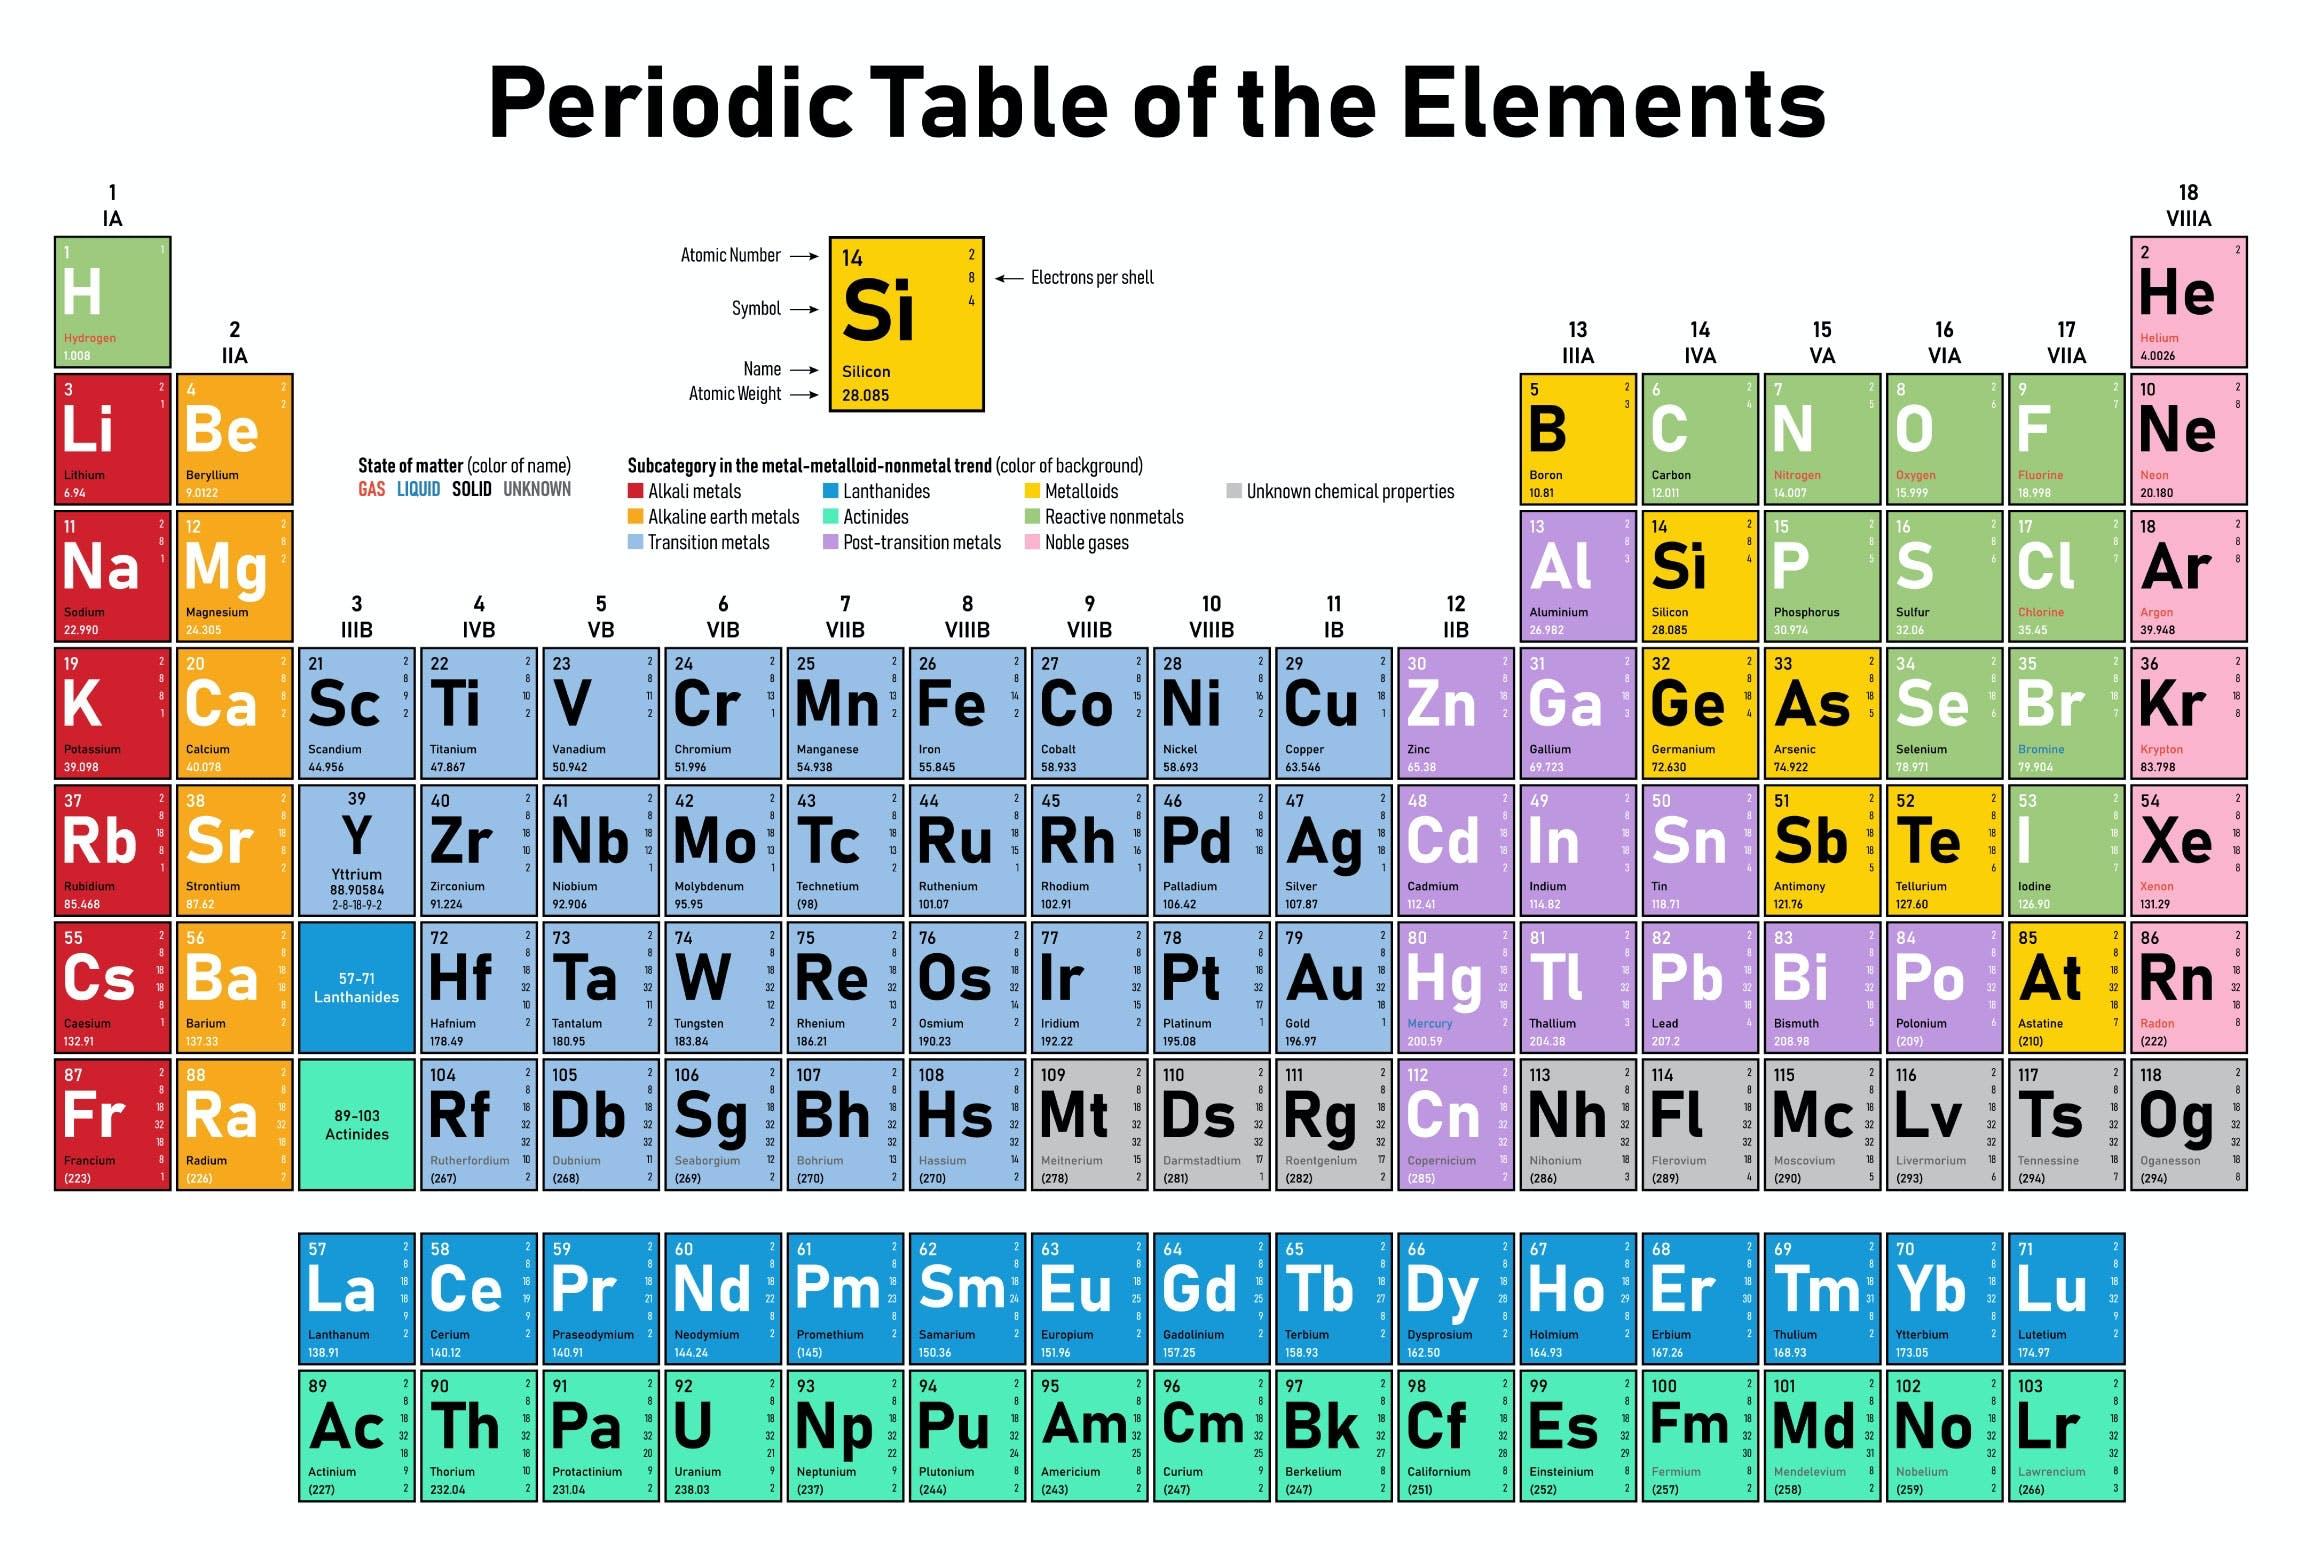 Grundstoffer i det periodiske system